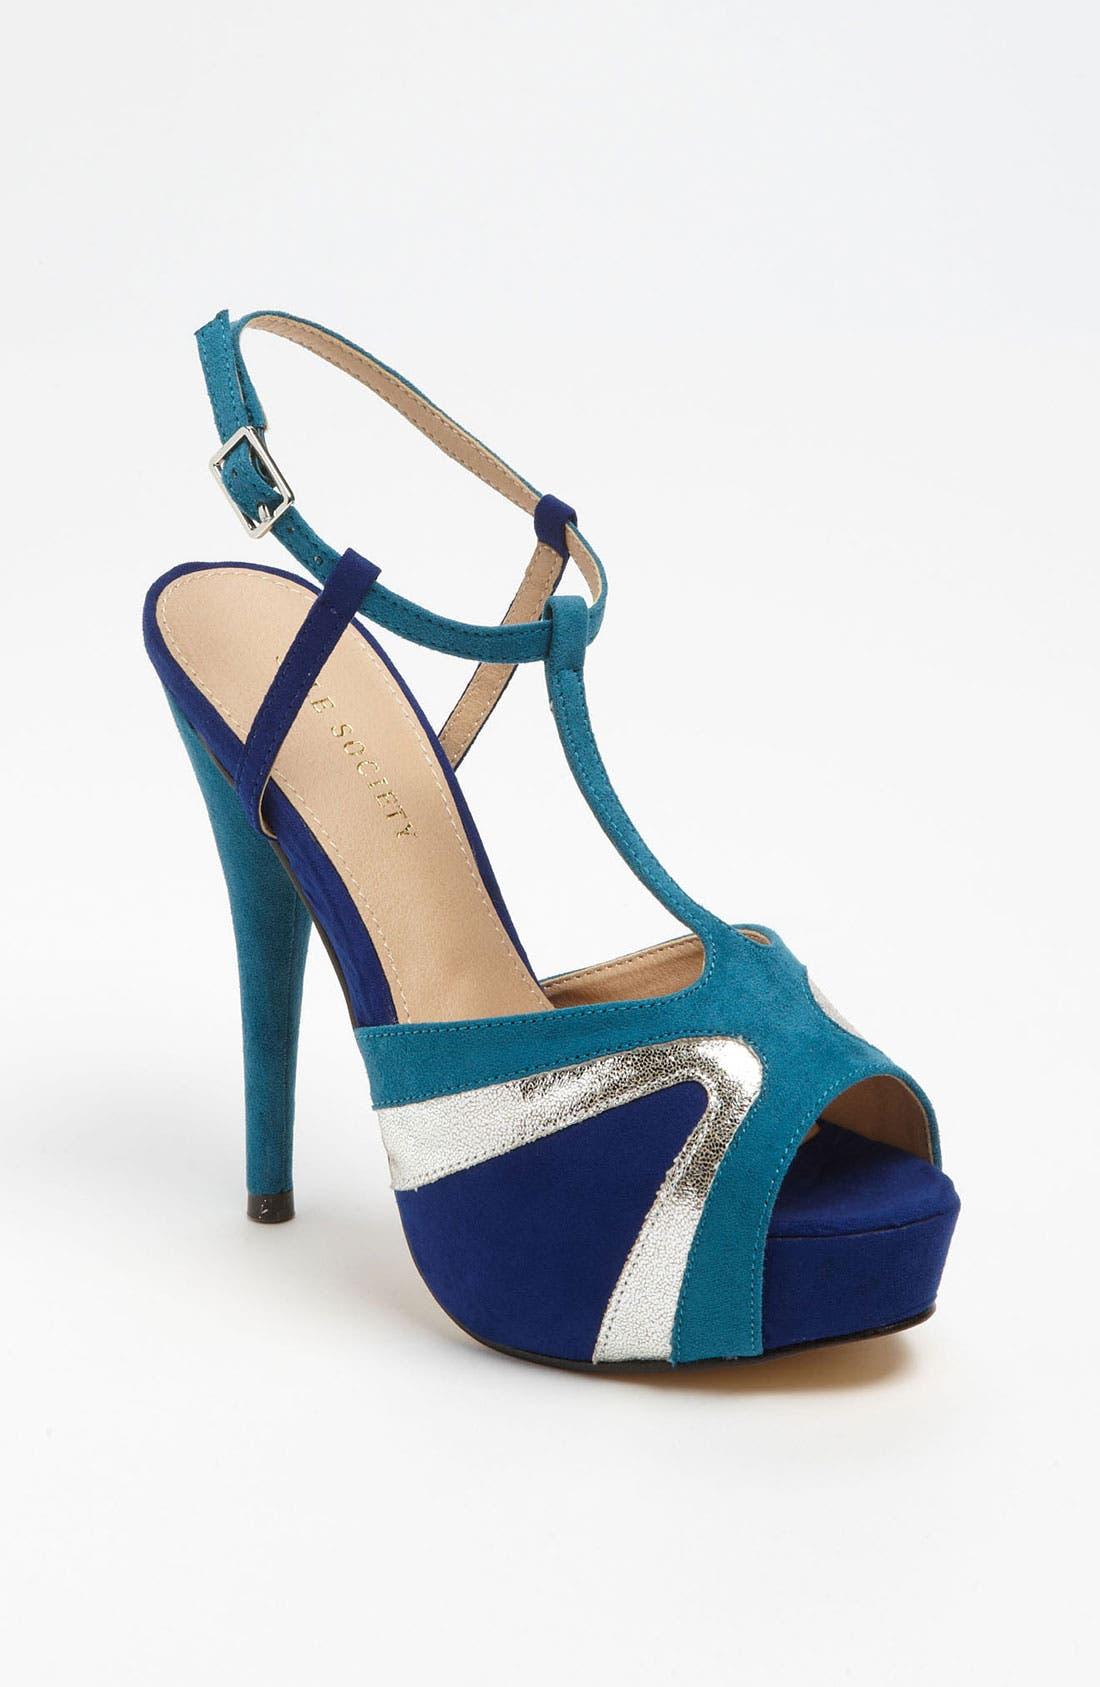 Alternate Image 1 Selected - Sole Society 'Gina' Sandal